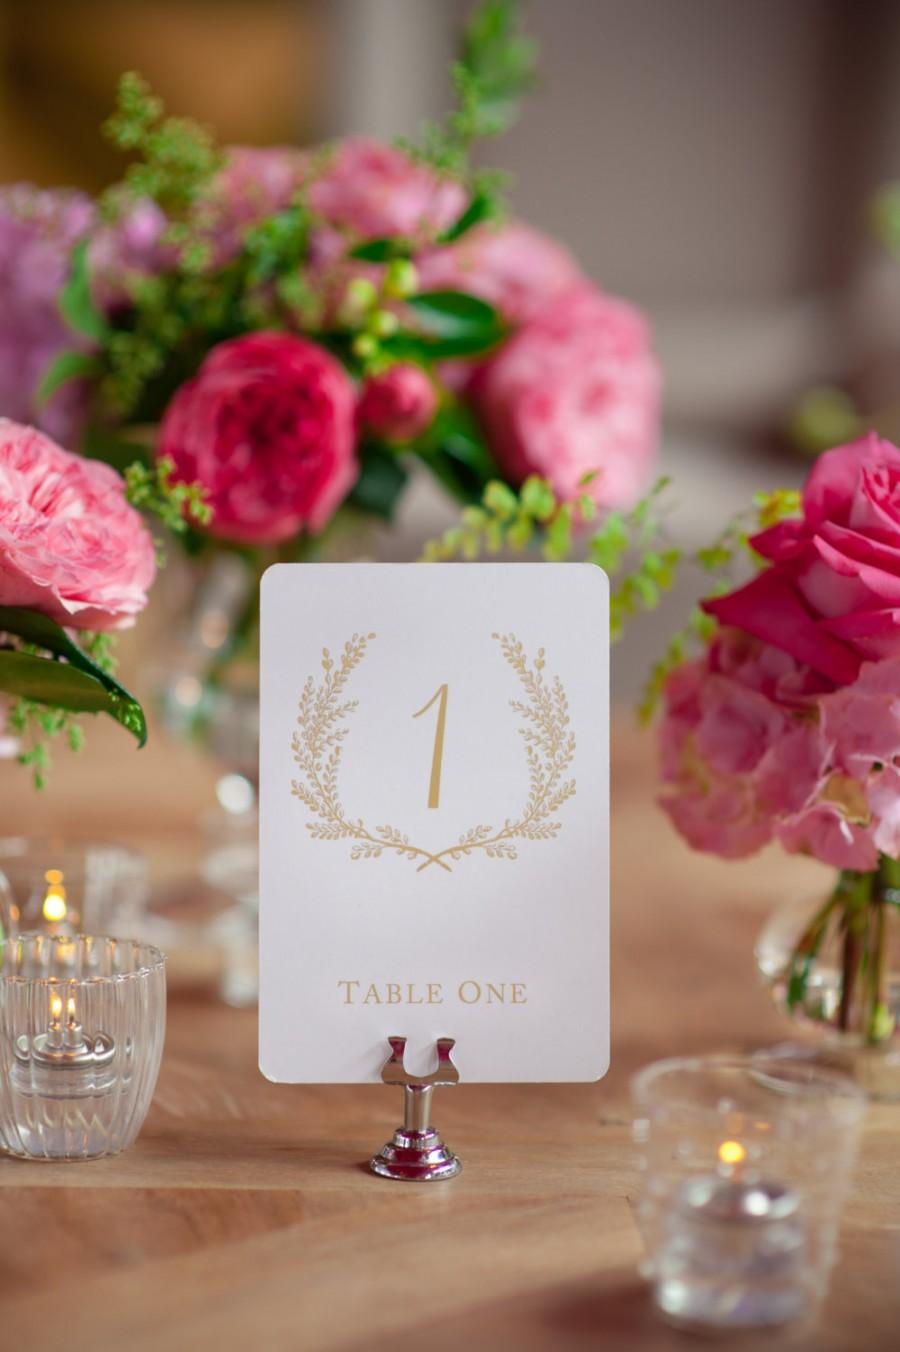 Mariage - Sweet Vintage Wedding Table Number Signs 1-10 Matte Gold